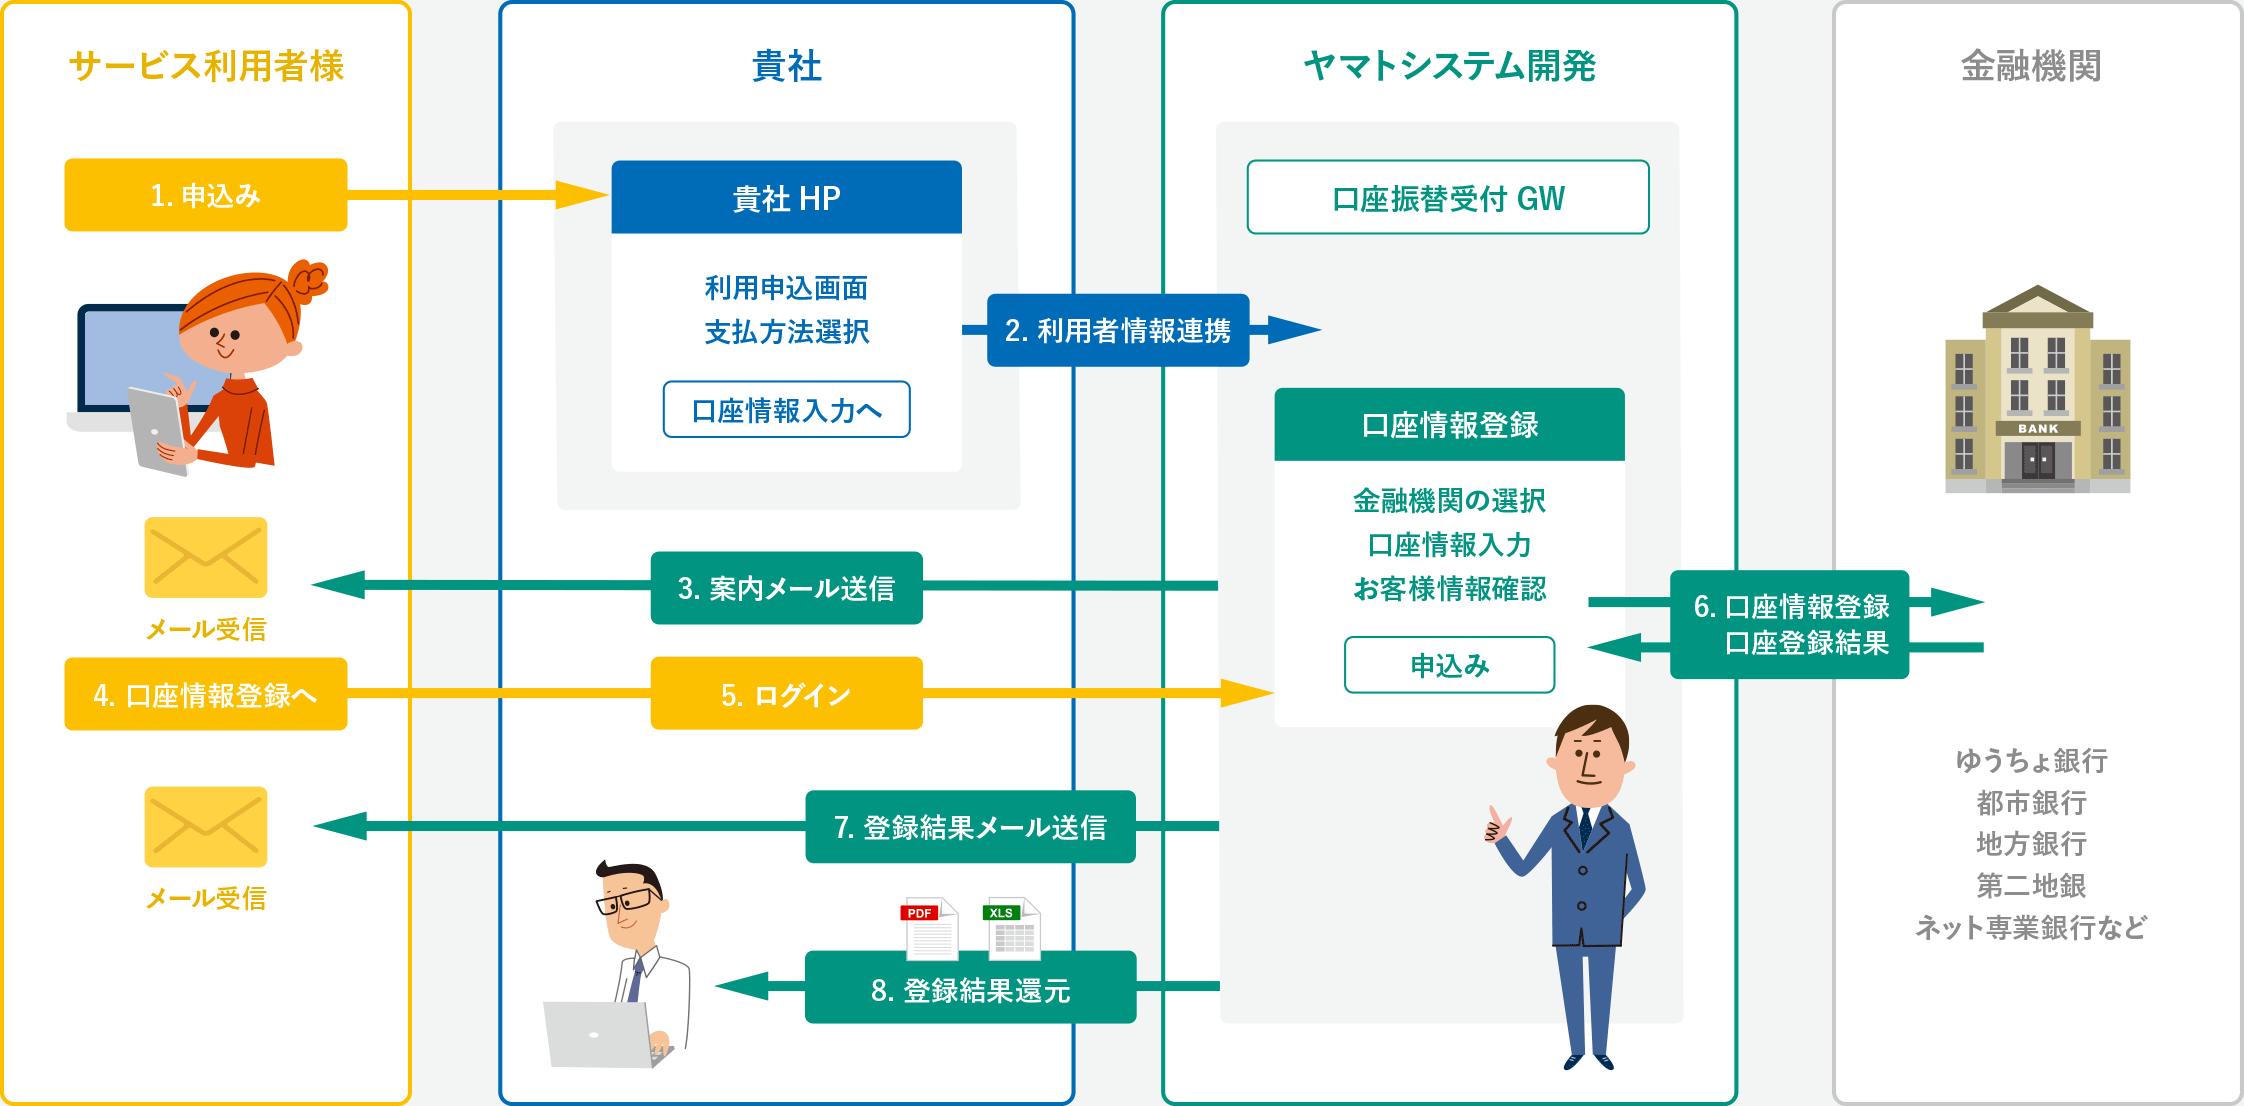 Web口座振替受付サービスの概要図